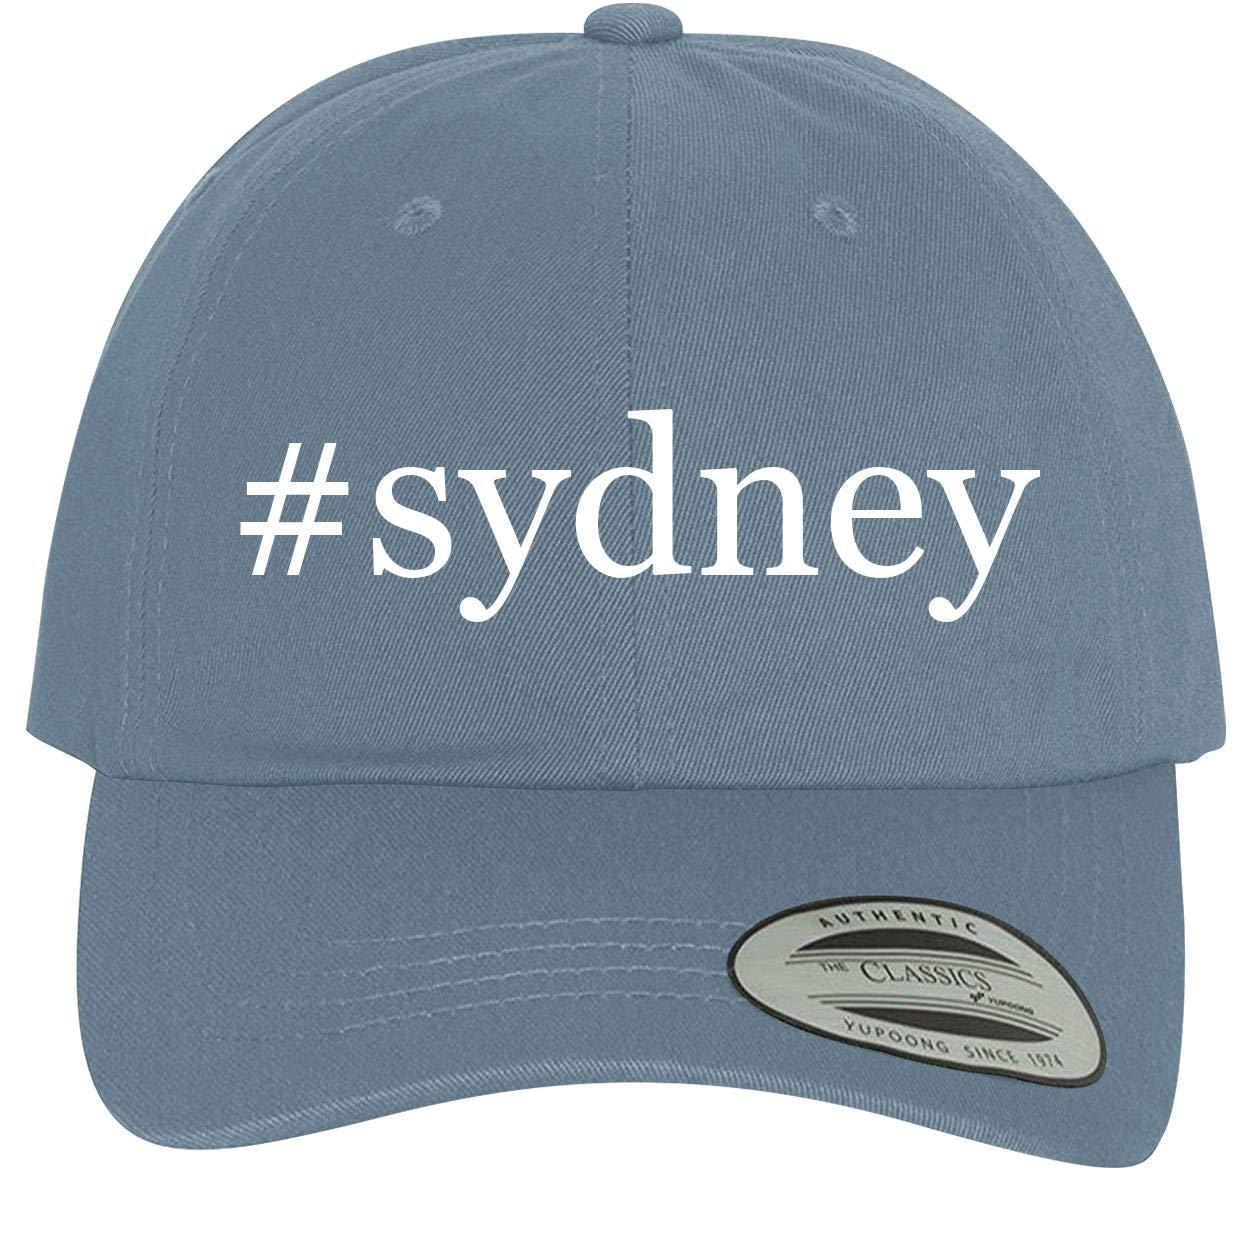 Comfortable Dad Hat Baseball Cap BH Cool Designs #Sydney